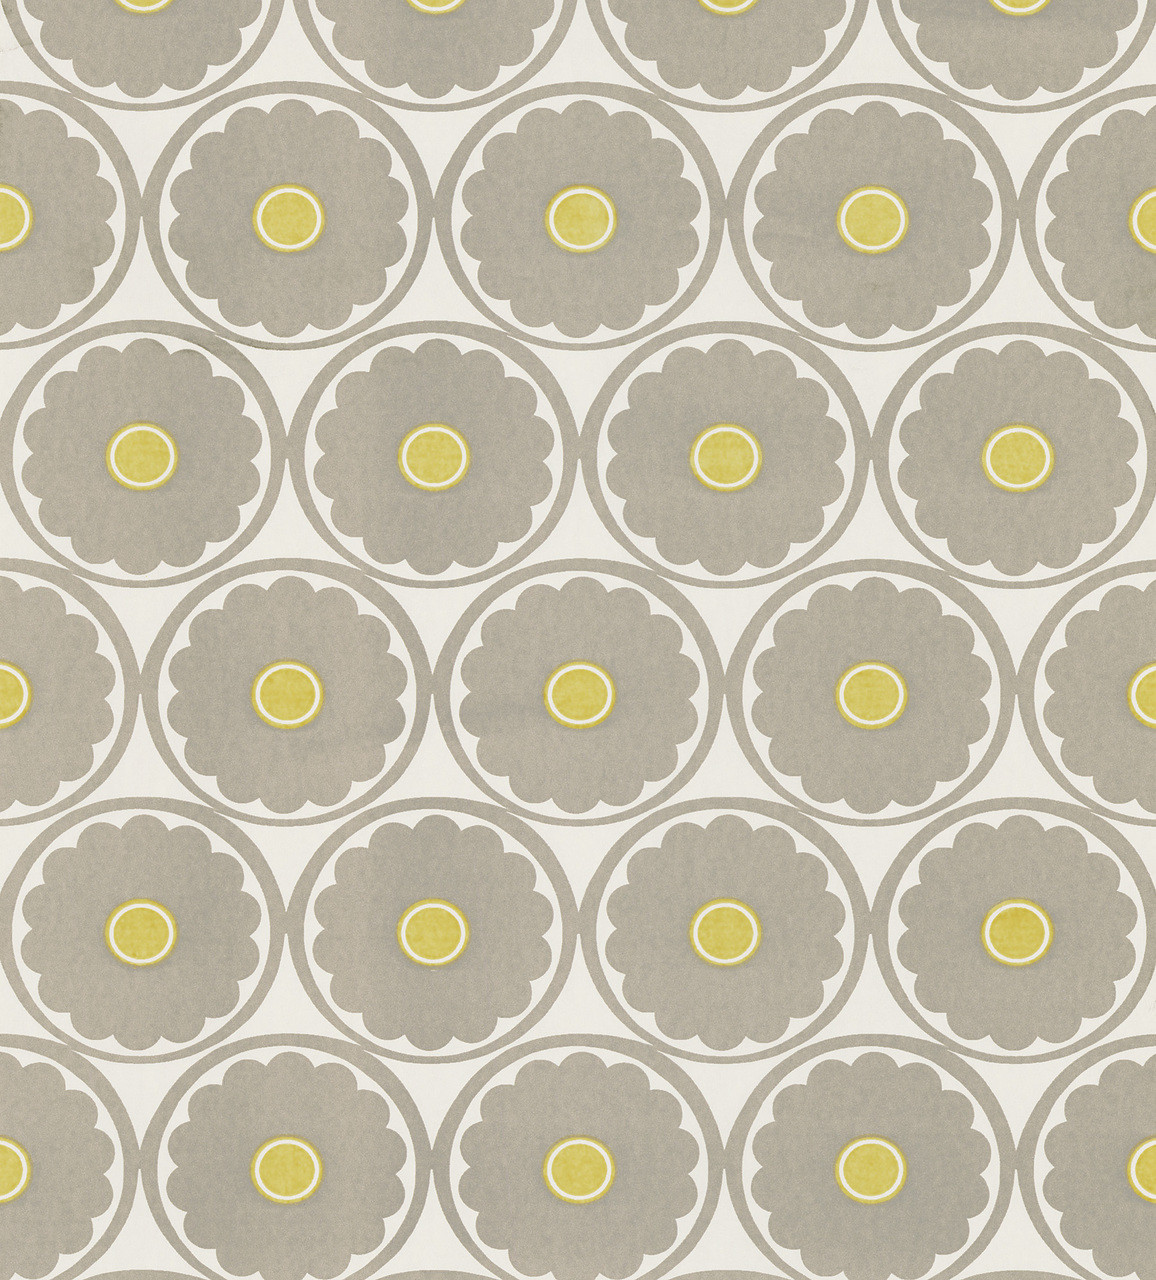 566 44900 Flower Power Light Grey Retro Floral Wallpaper